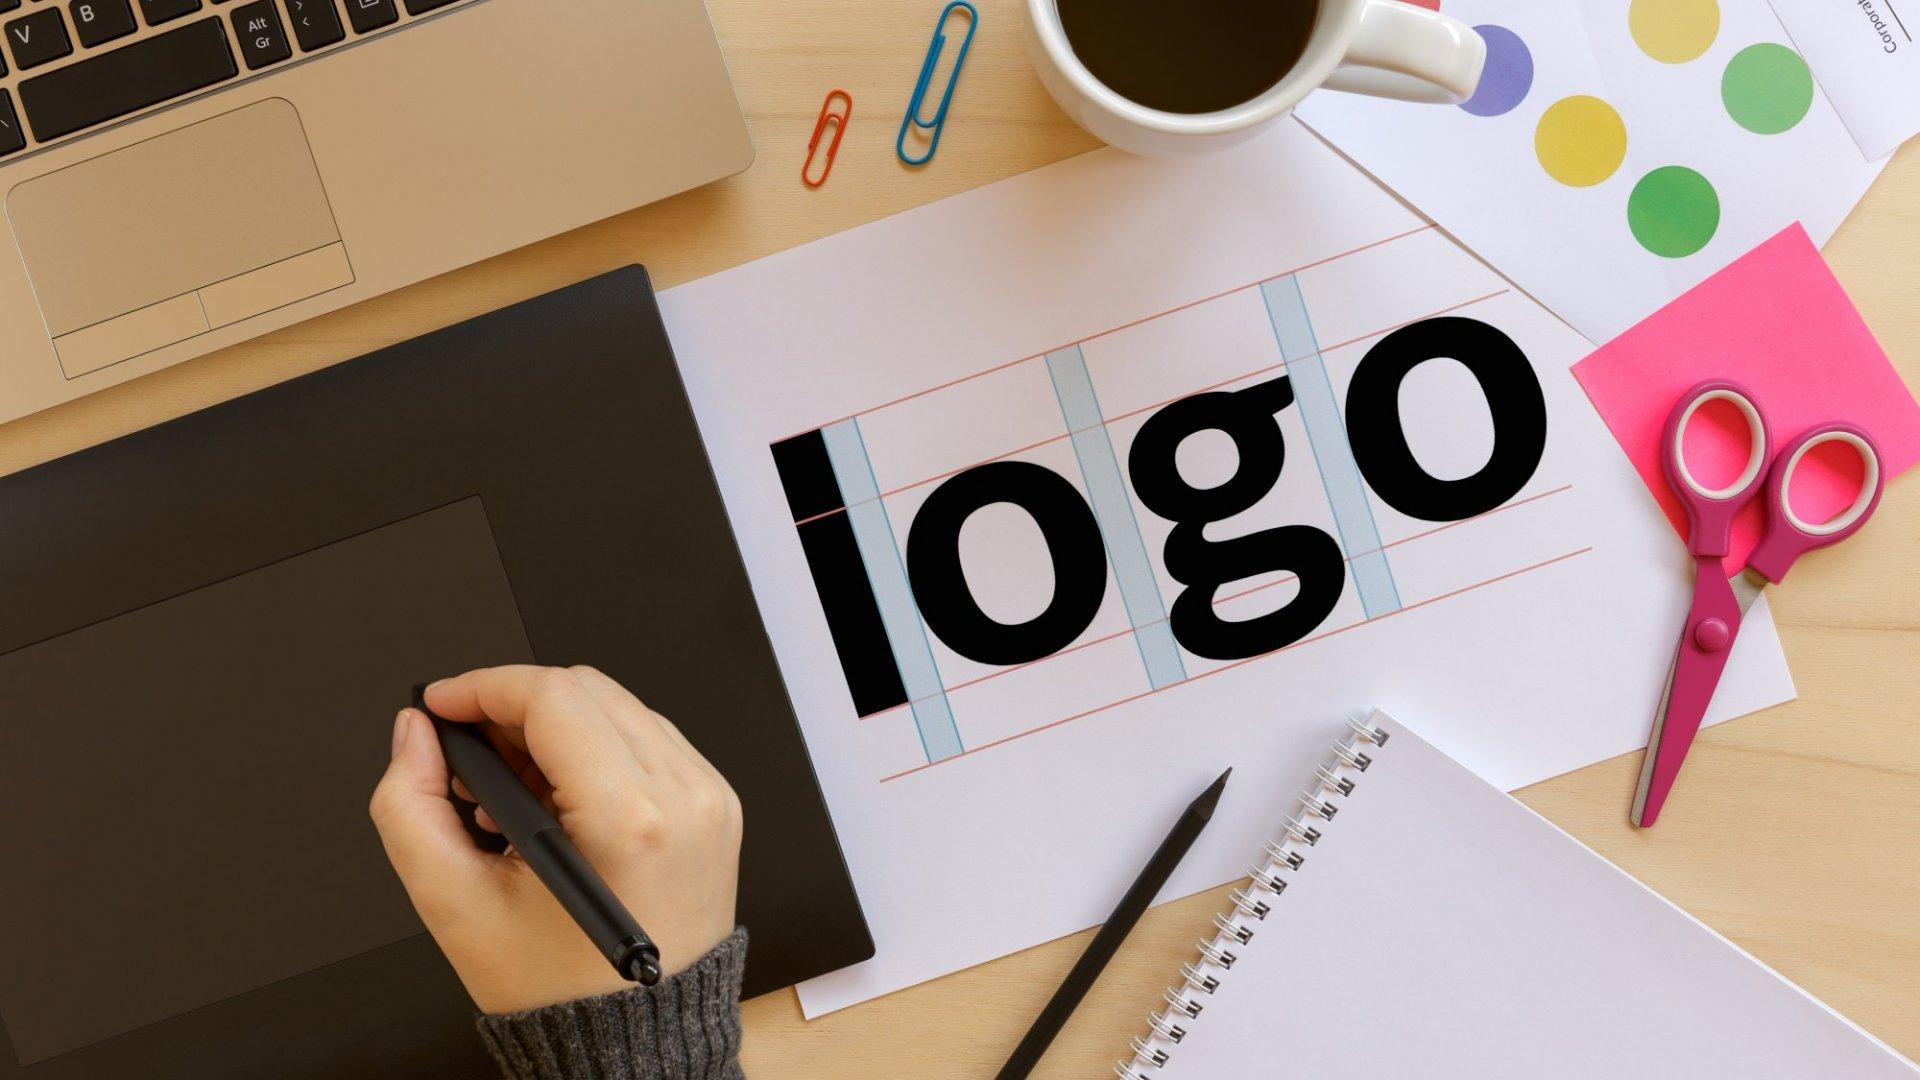 Tips for creating an award-winning logo.